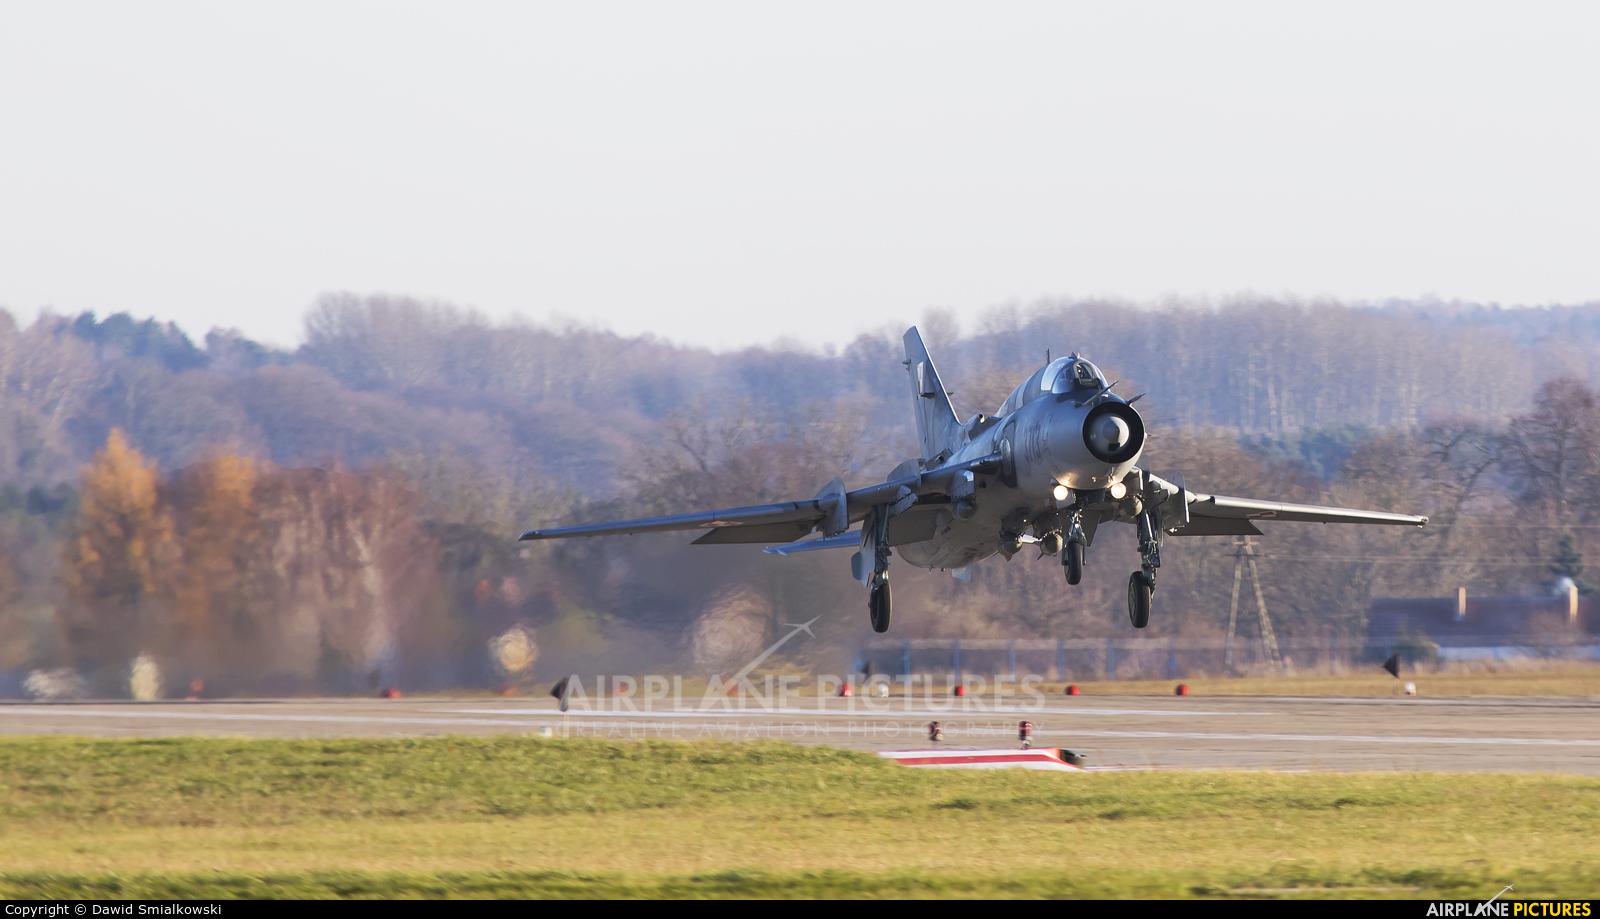 Poland - Air Force 3713 aircraft at Świdwin